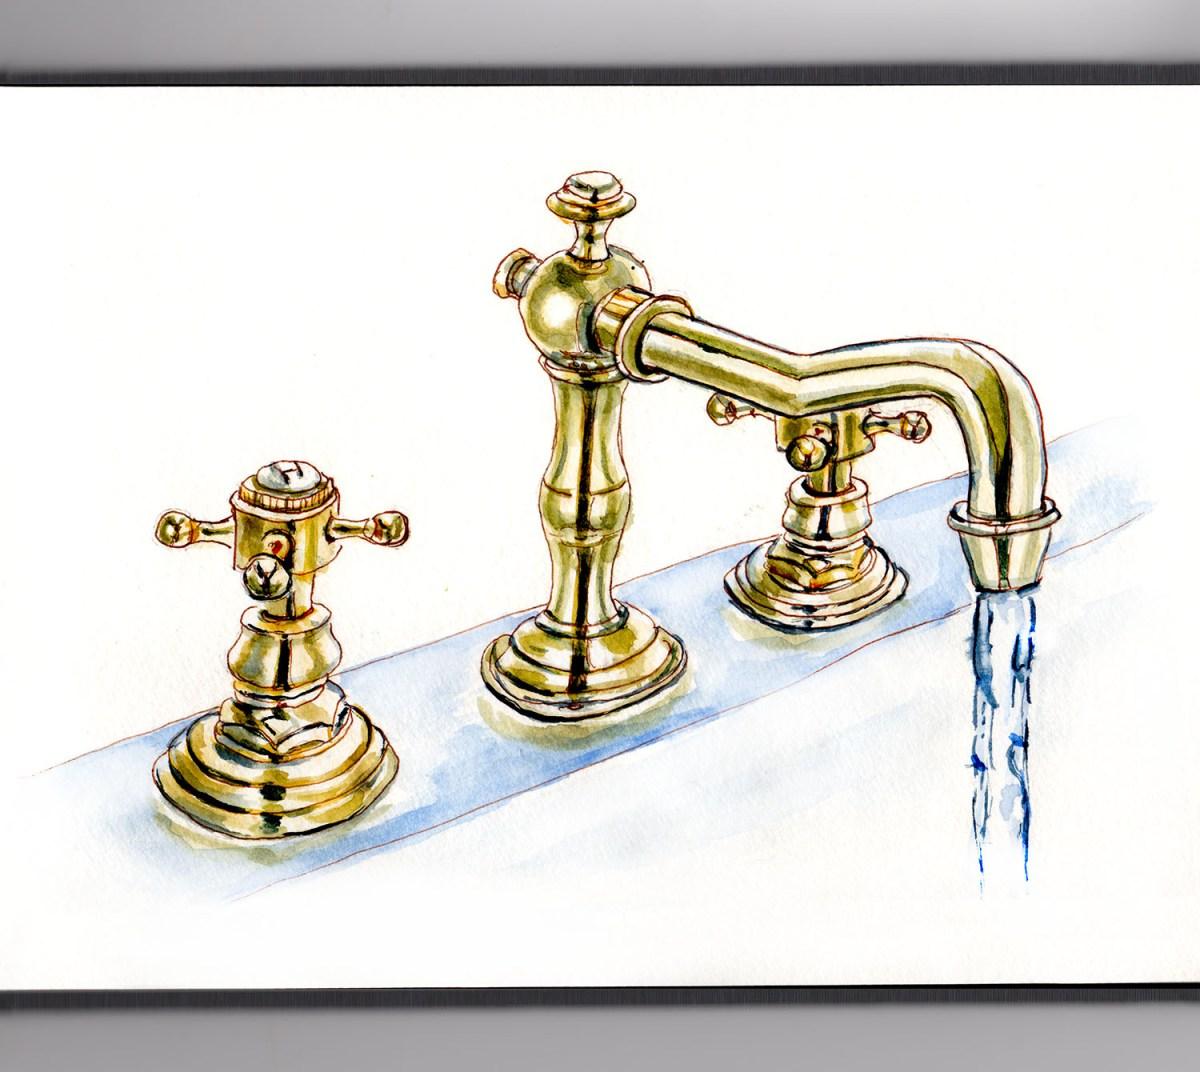 #WorldWatercolorGroup - Day 6 - A Long Hot Bath - Bathroom Faucet - Doodlewash